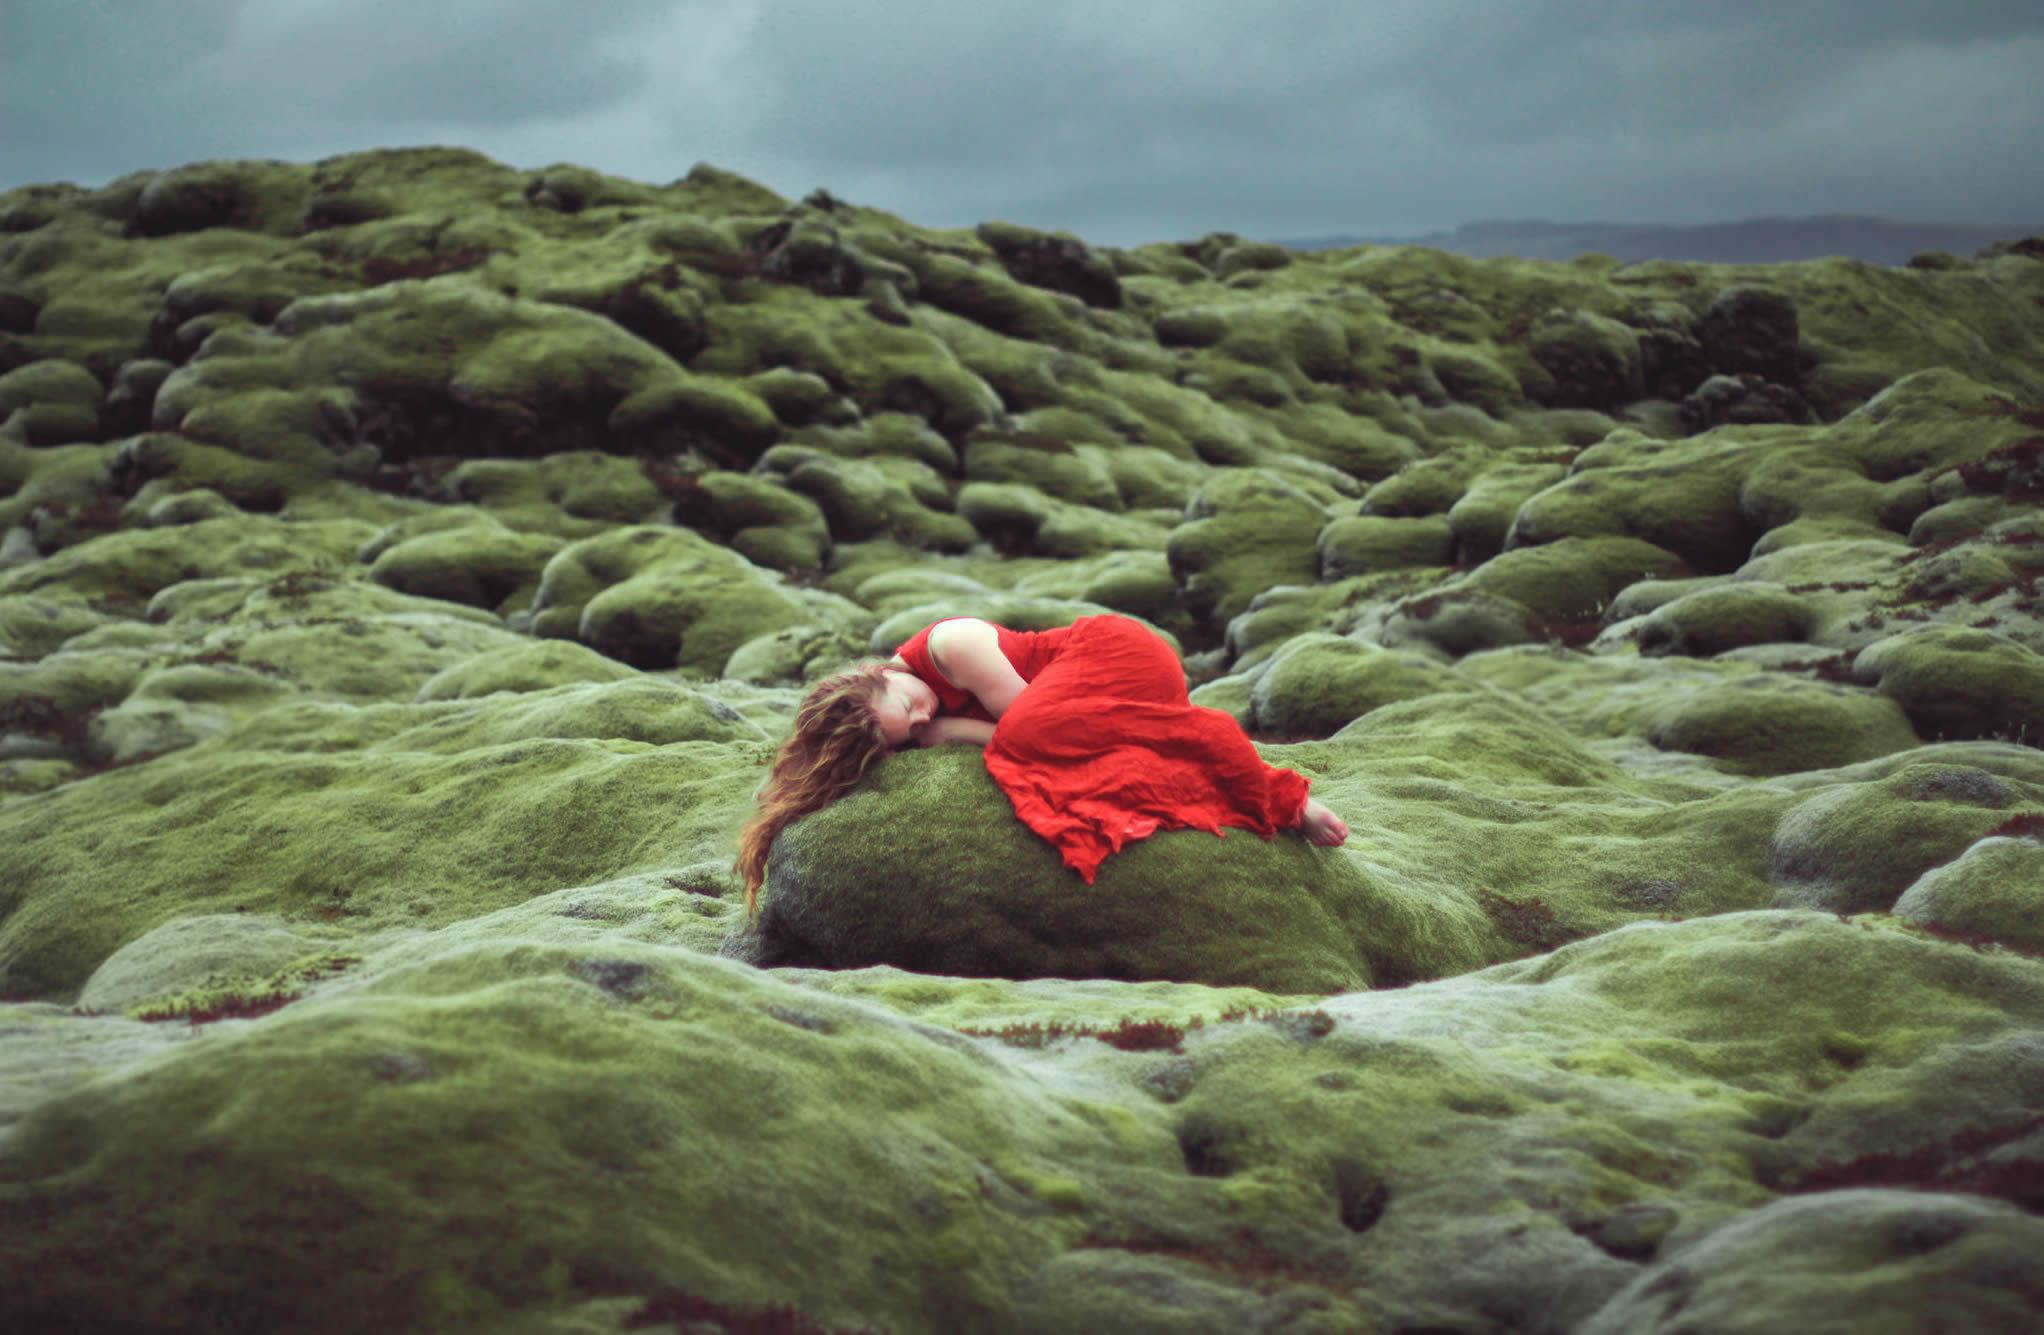 girl with red dress on rock, green landscape, photo by elizabeth gadd